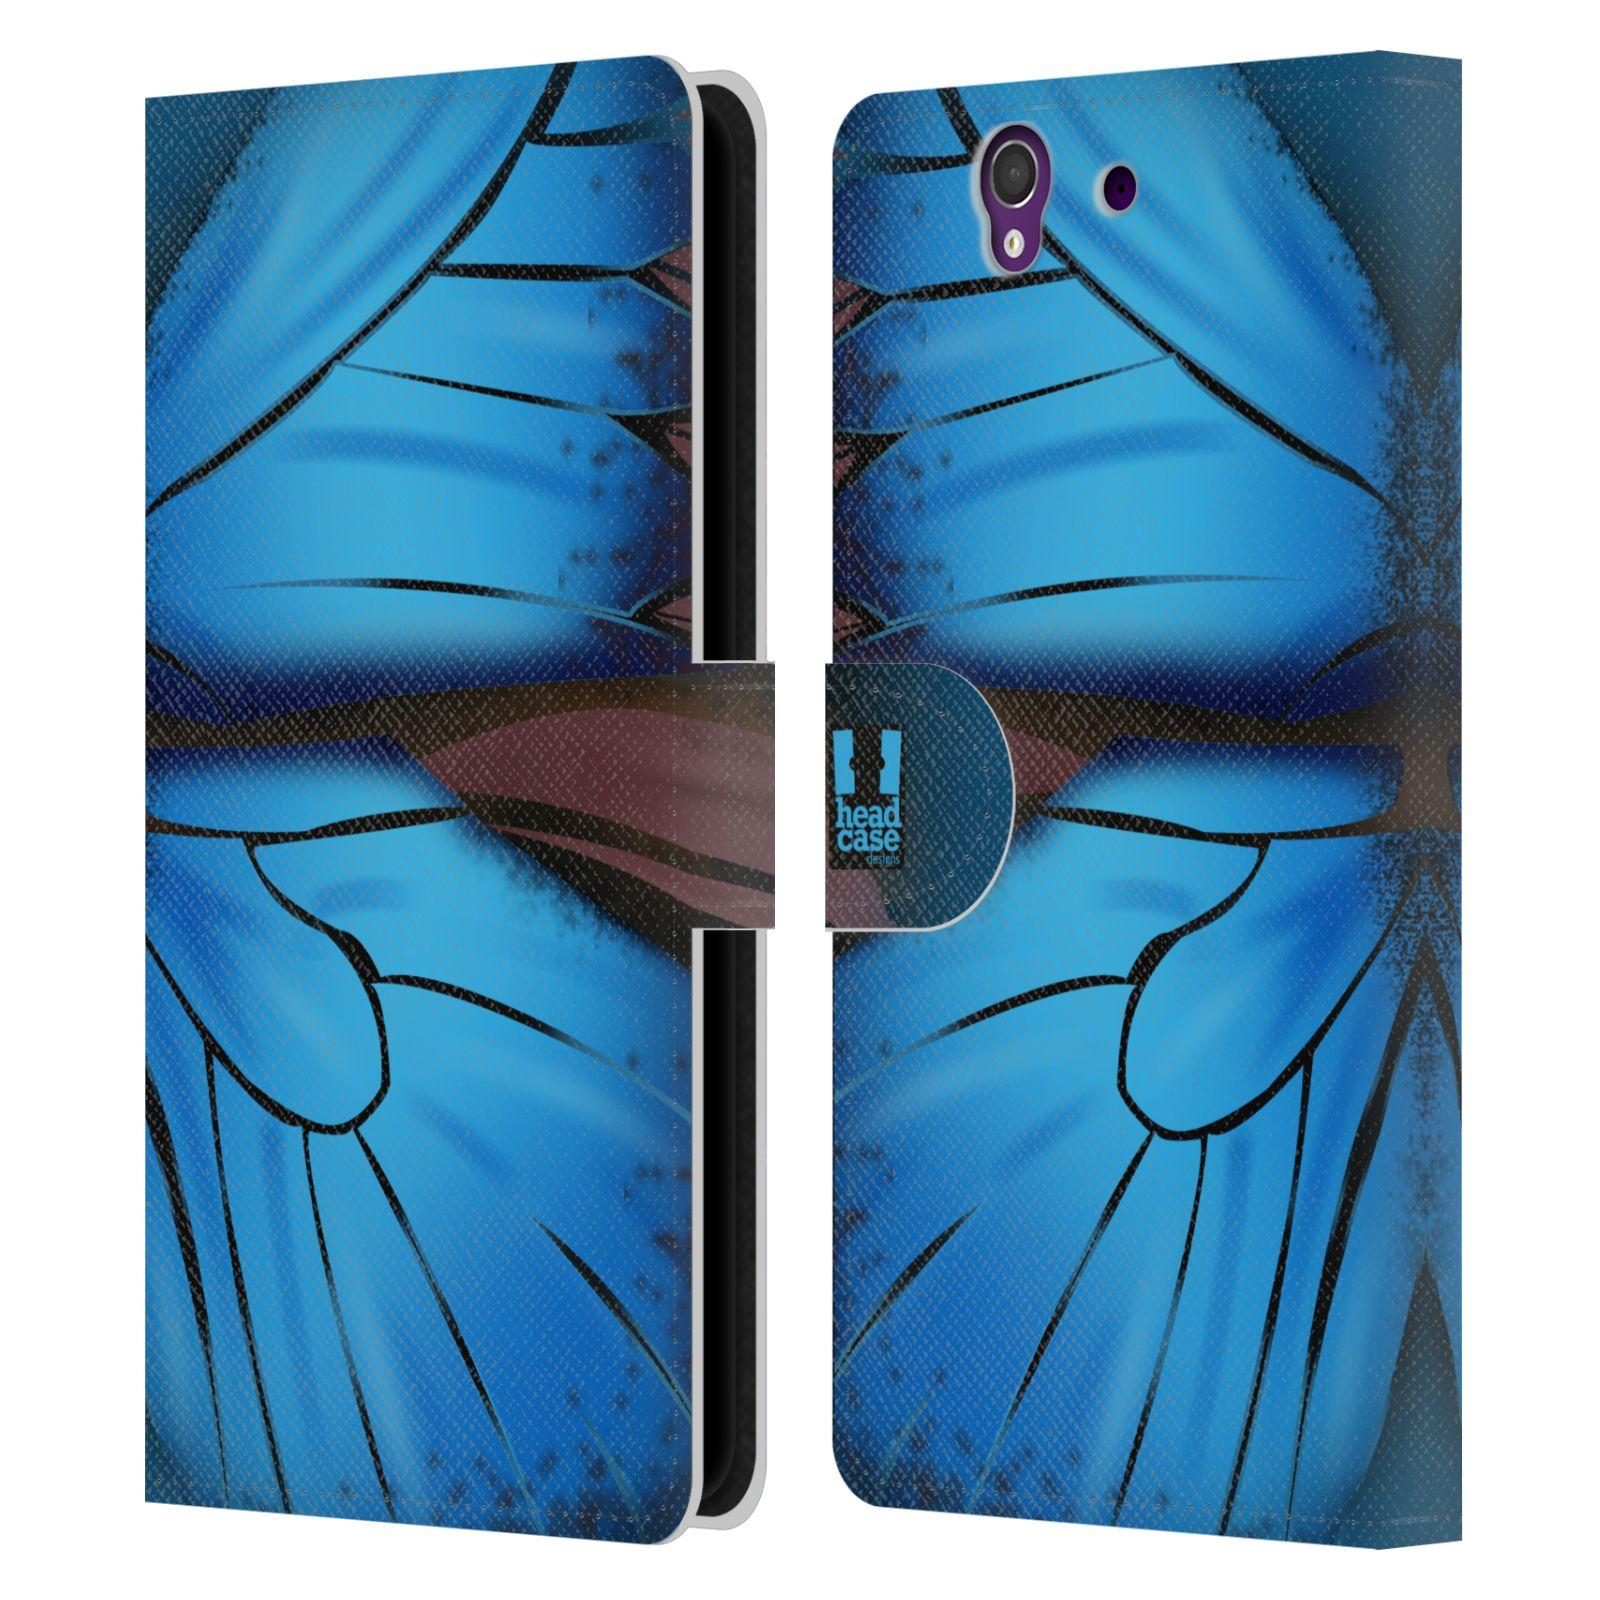 HEAD CASE Flipové pouzdro pro mobil SONY XPERIA Z (C6603) motýl a křídla kreslený vzor modrá barva